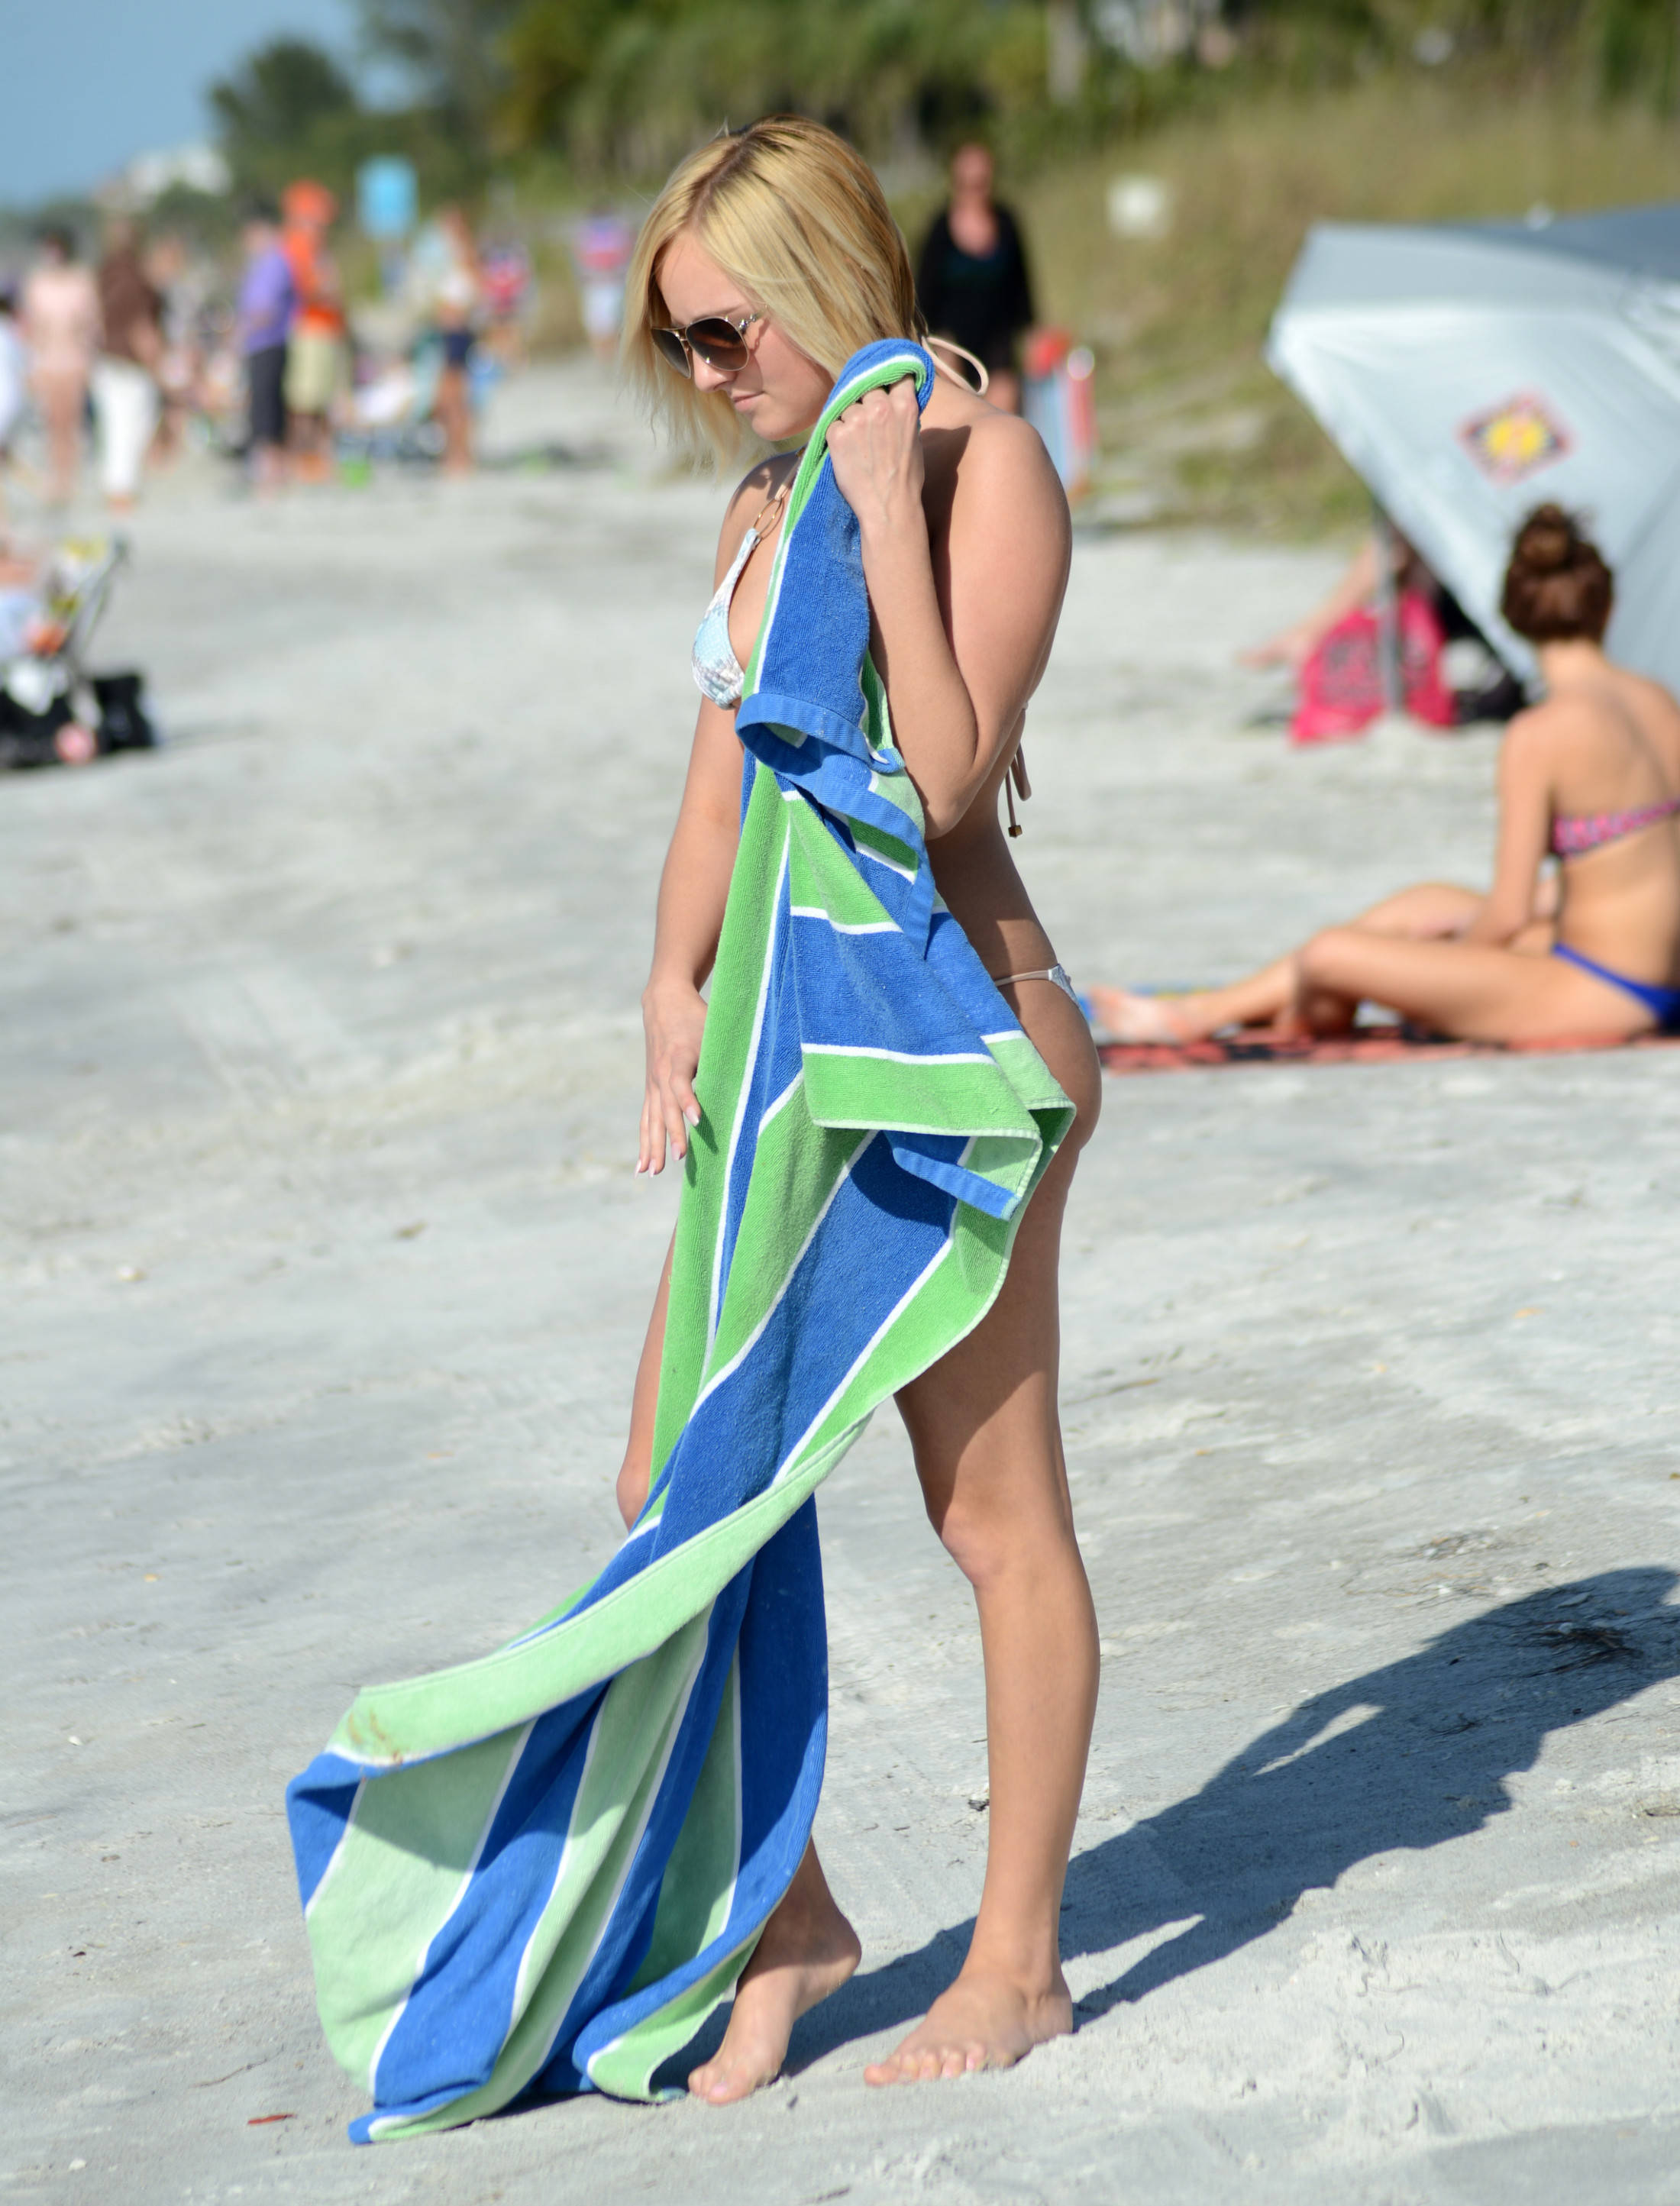 Erotica Bikini Kate England  nude (46 fotos), YouTube, panties